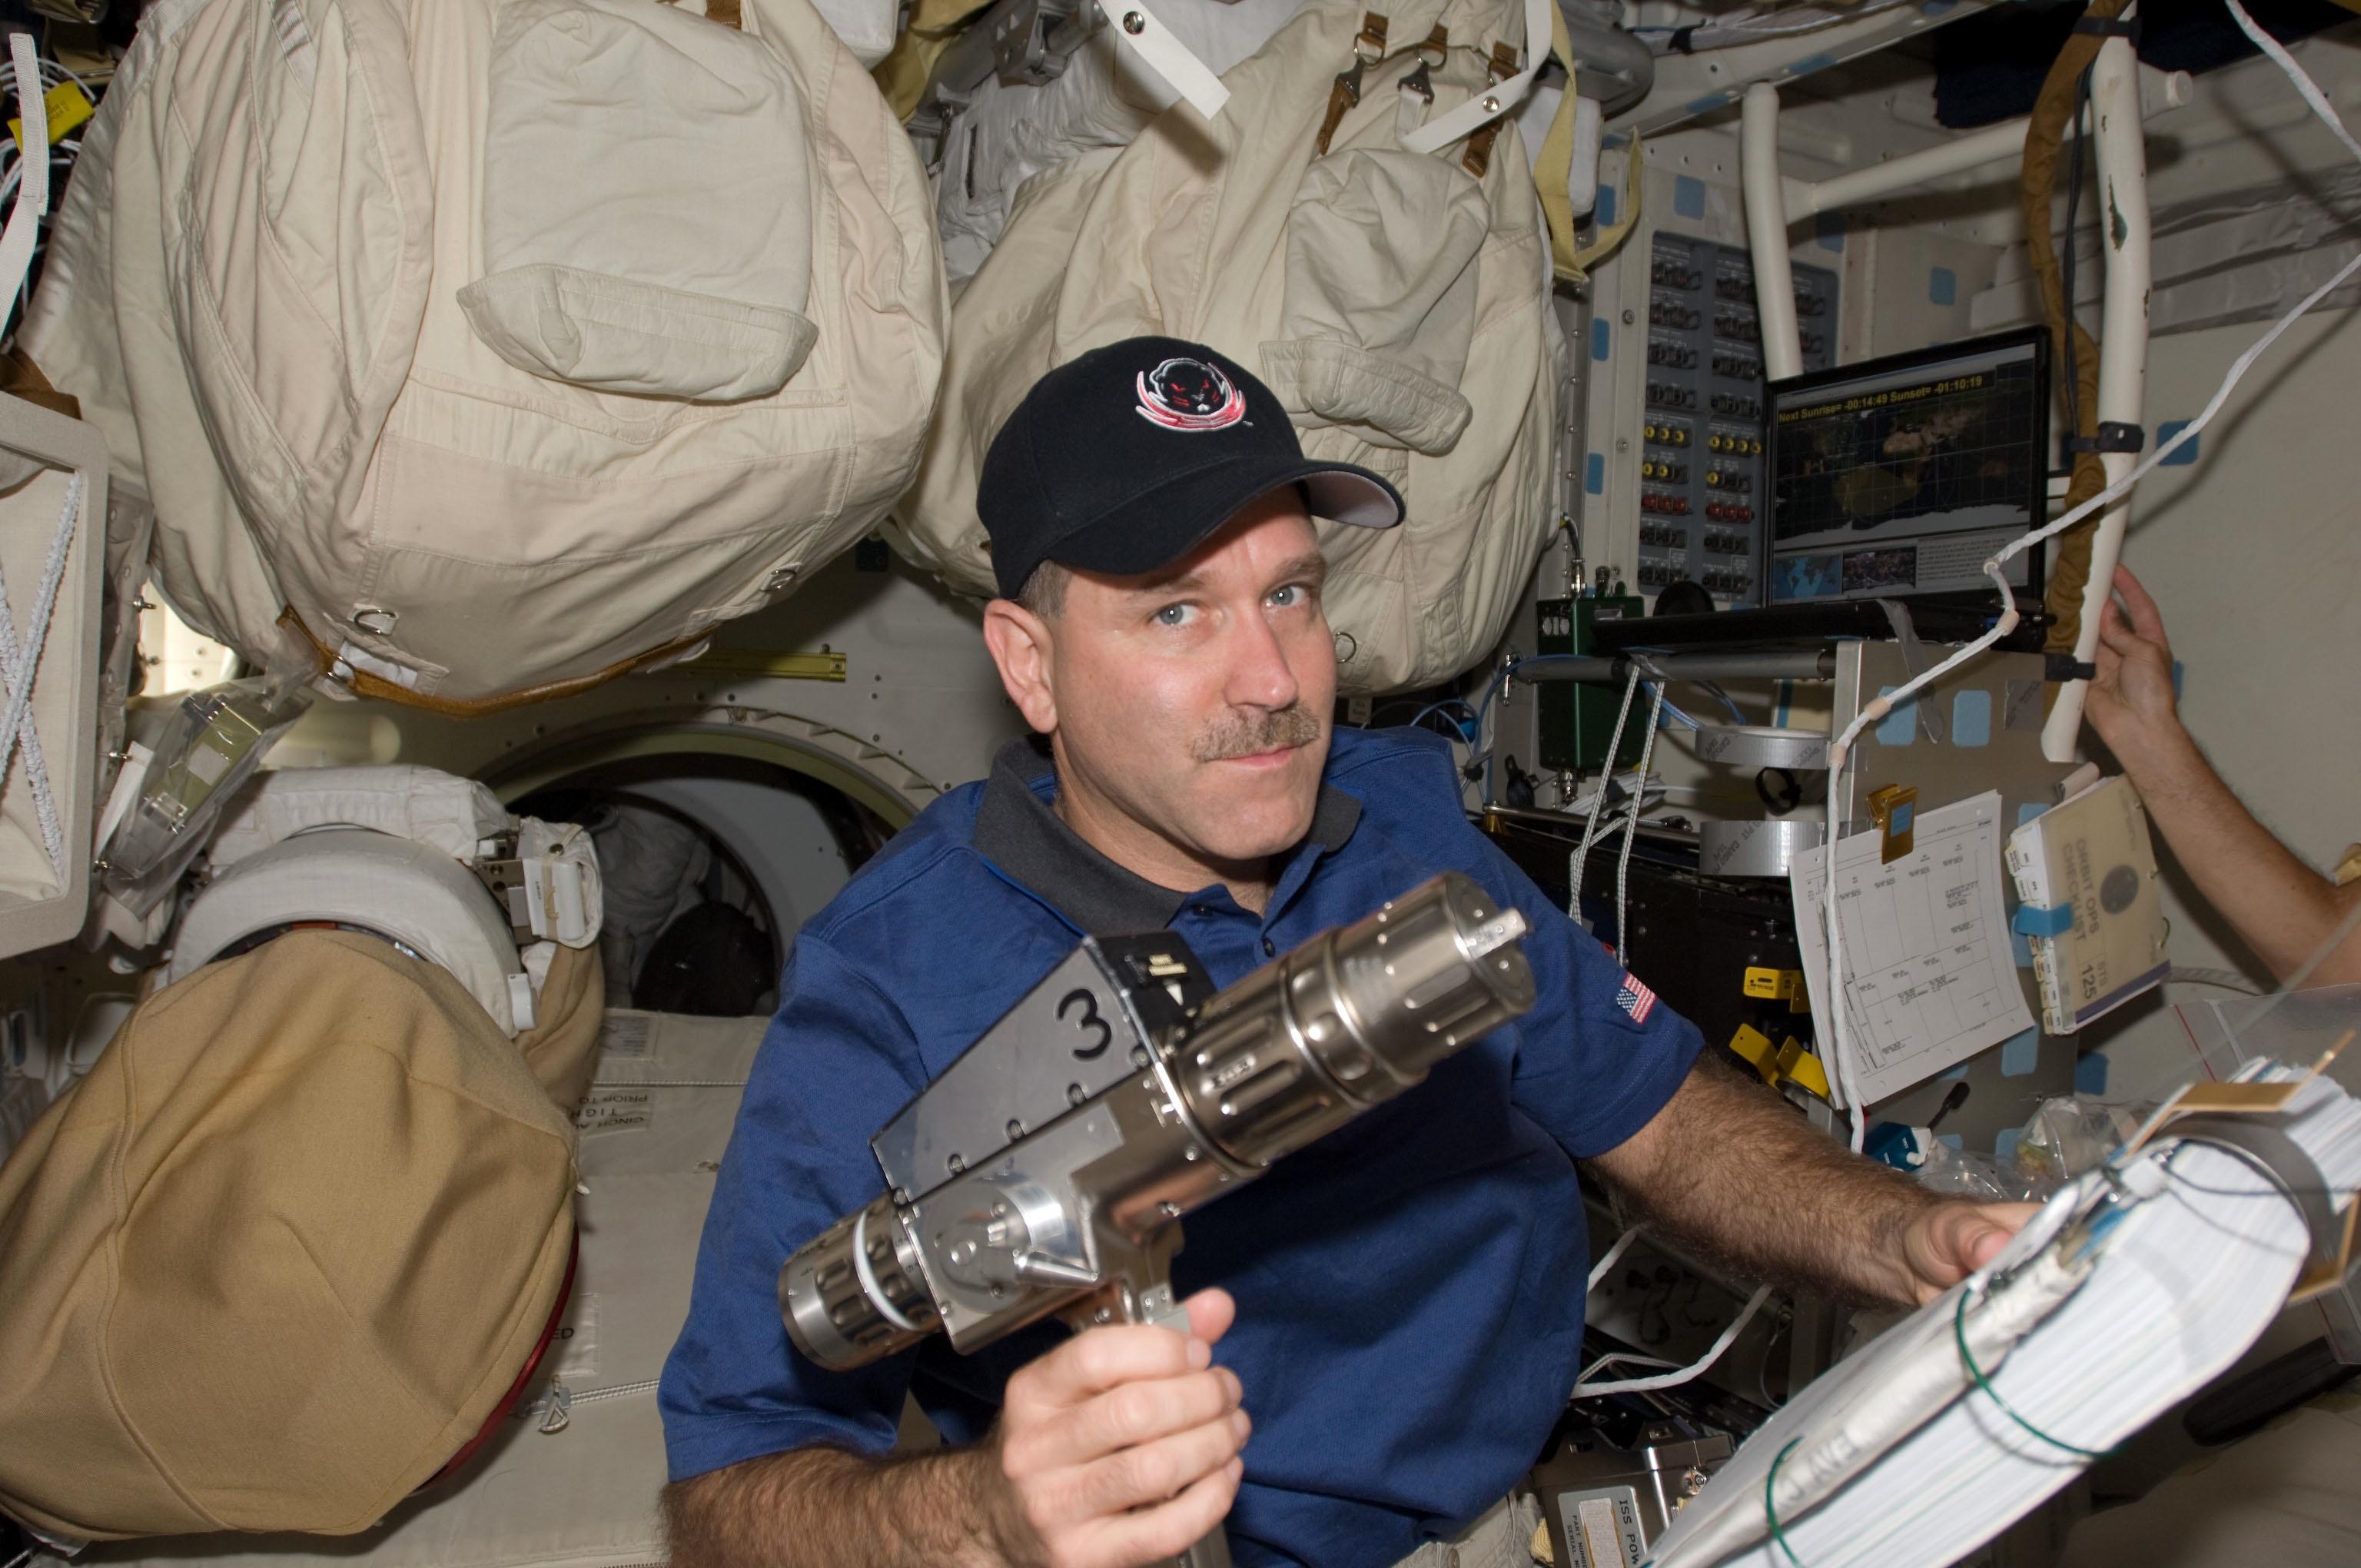 astronaut tools - photo #41